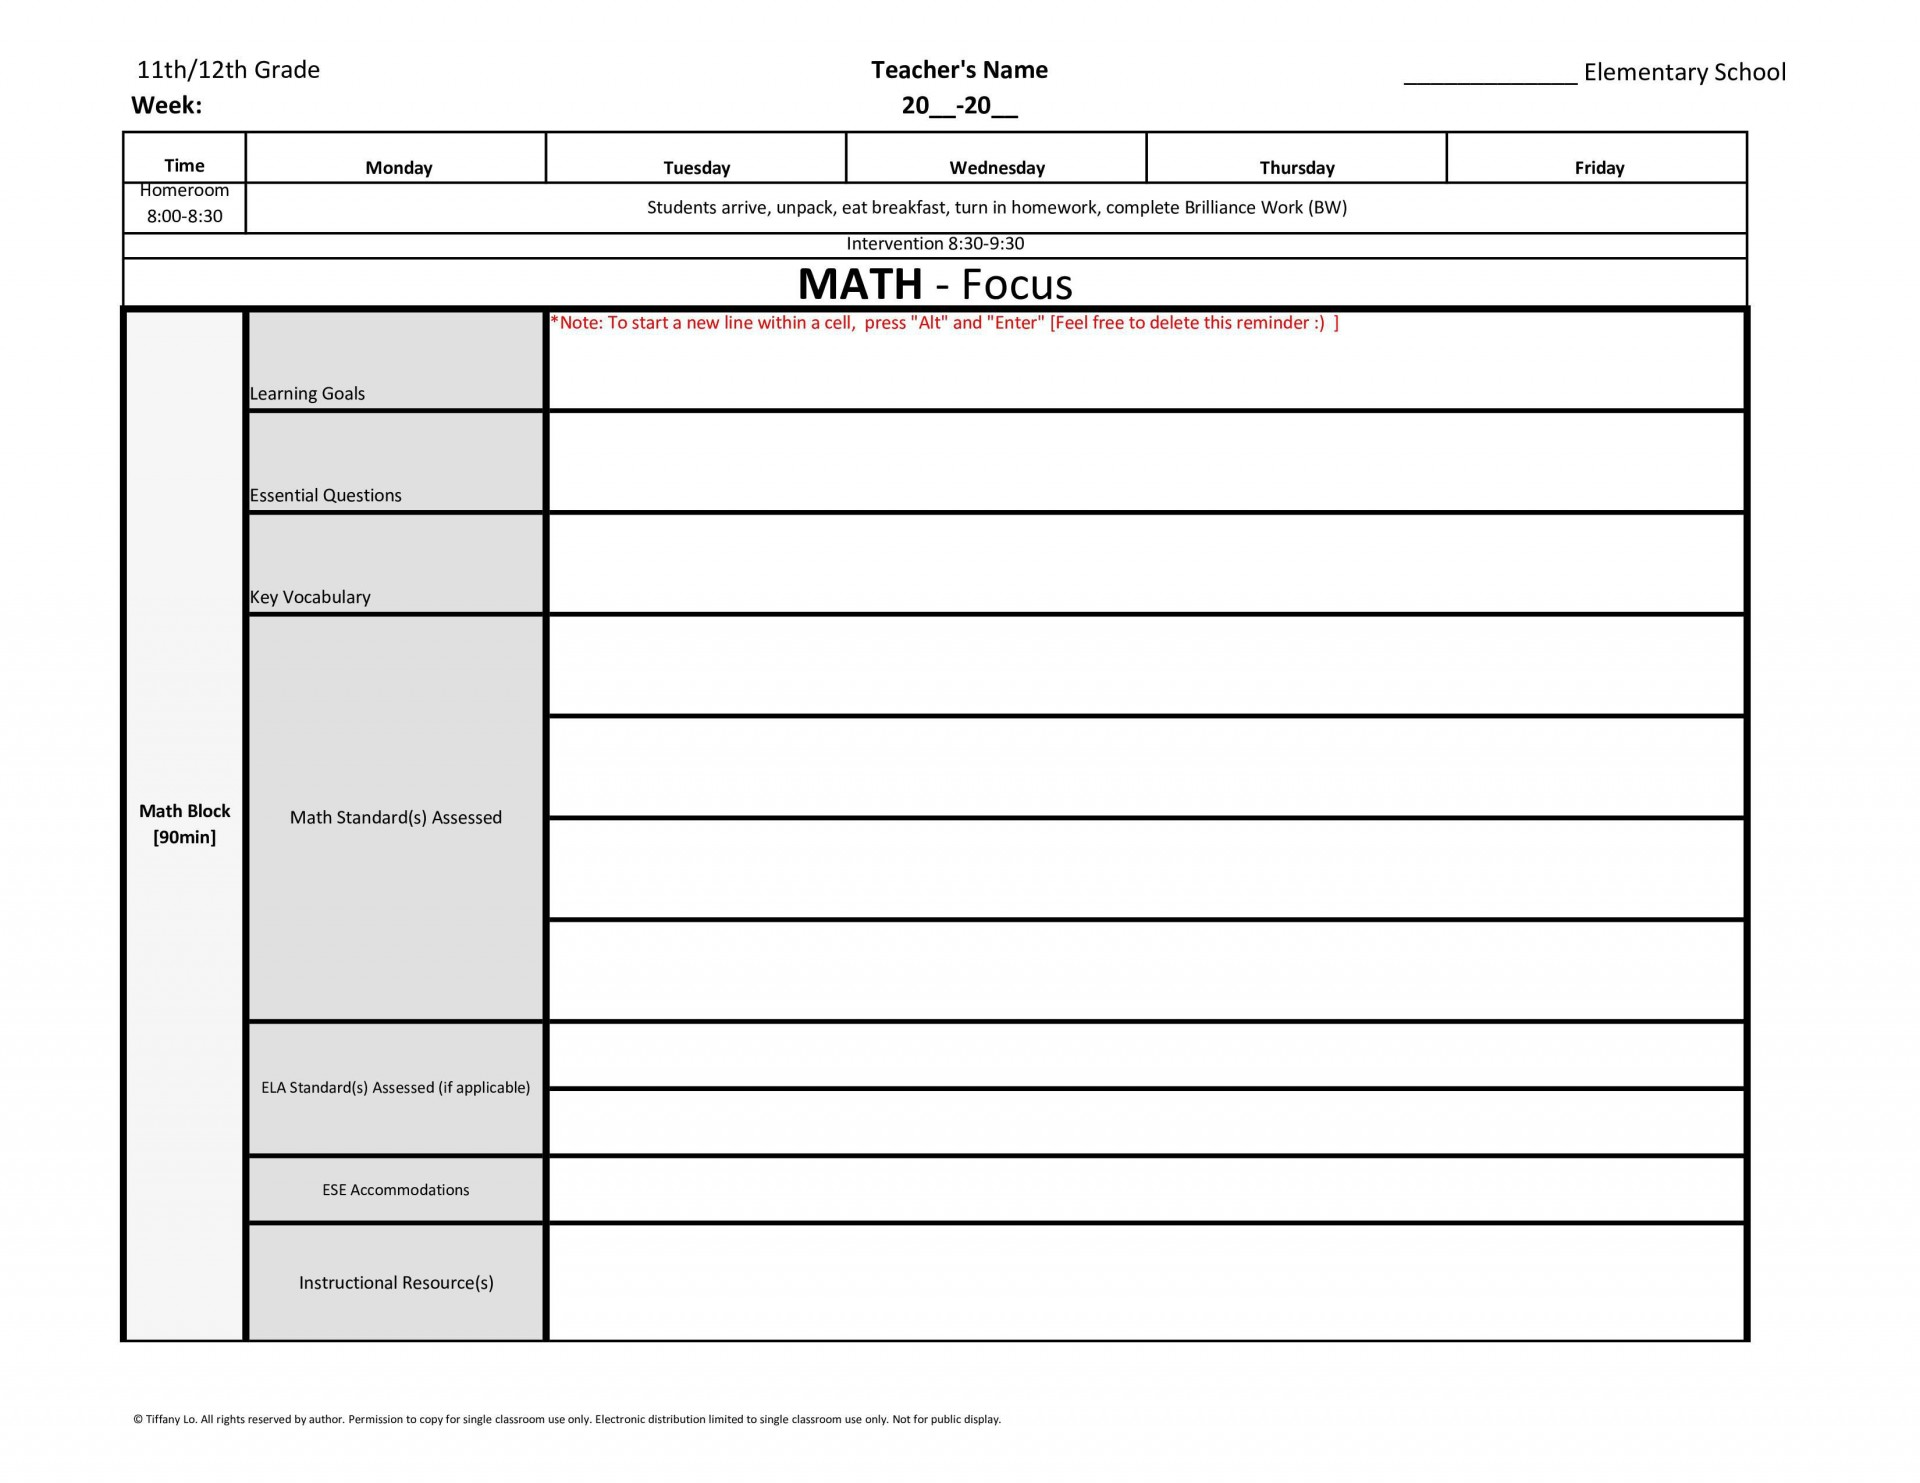 000 Formidable Blank Weekly Lesson Plan Template Inspiration  Printable Pdf Free Editable1920